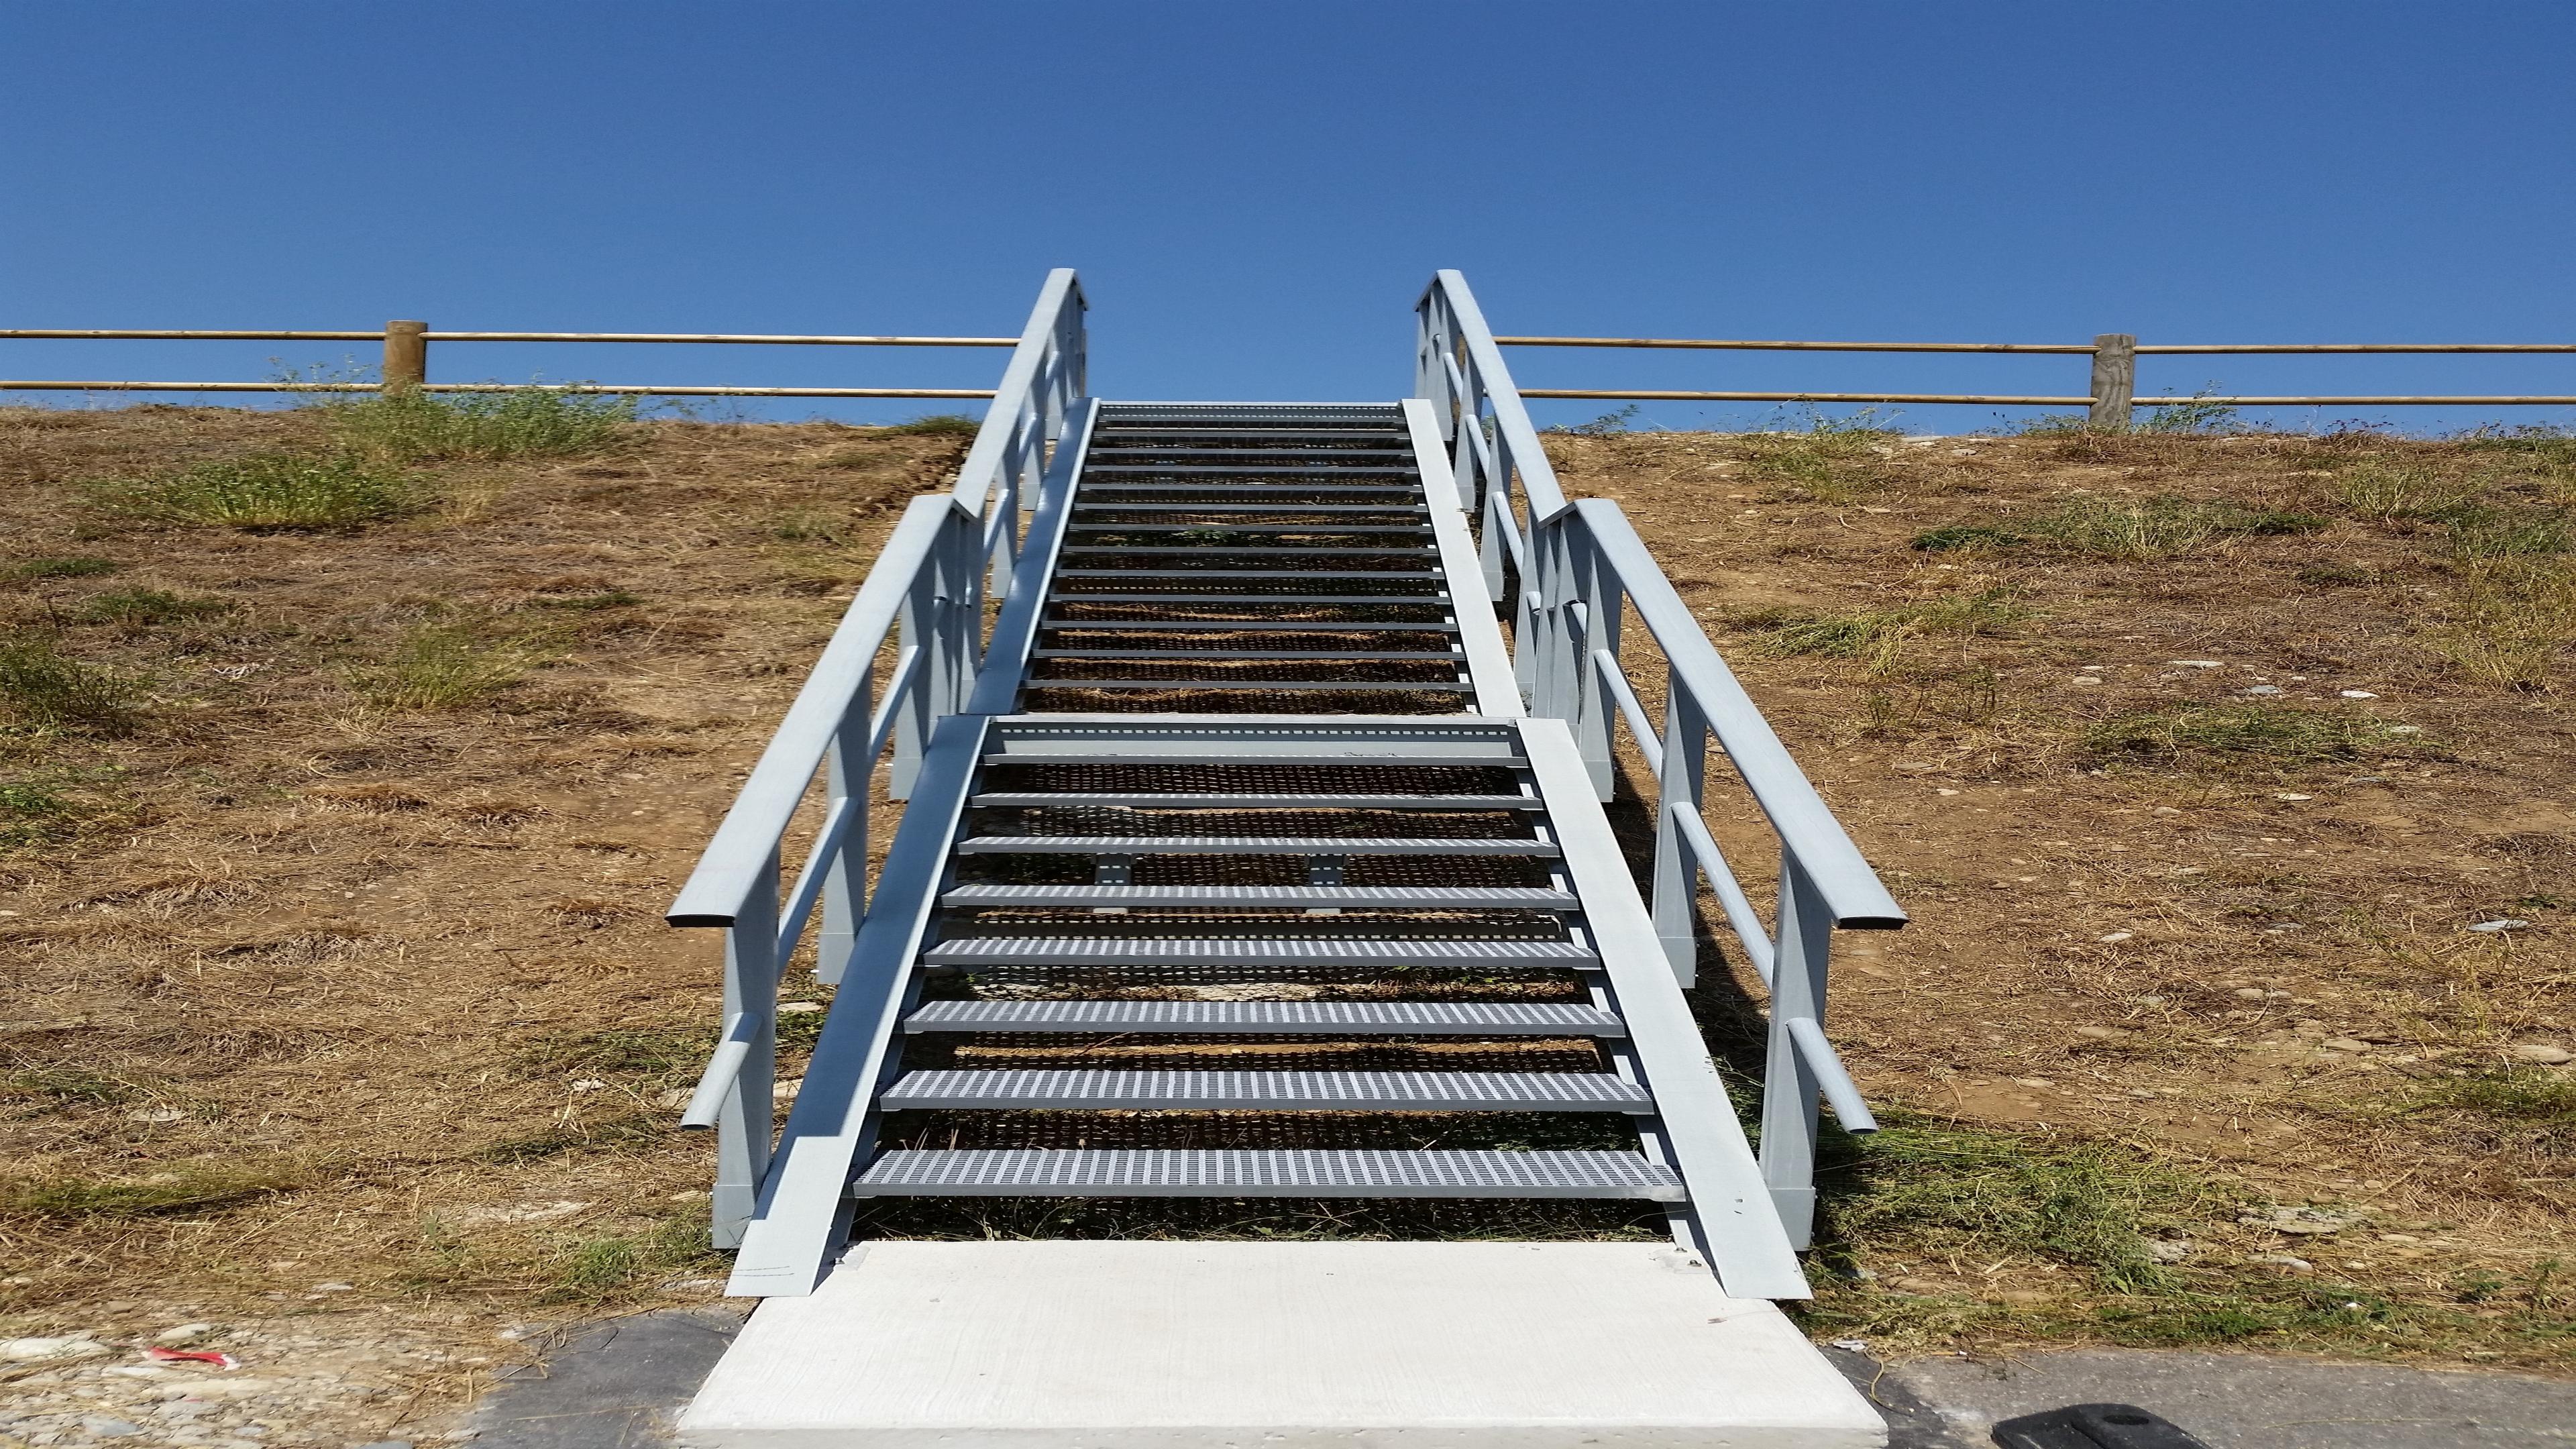 escalier composite escalier prv escalier resine polyester escalier fibre de verre. Black Bedroom Furniture Sets. Home Design Ideas